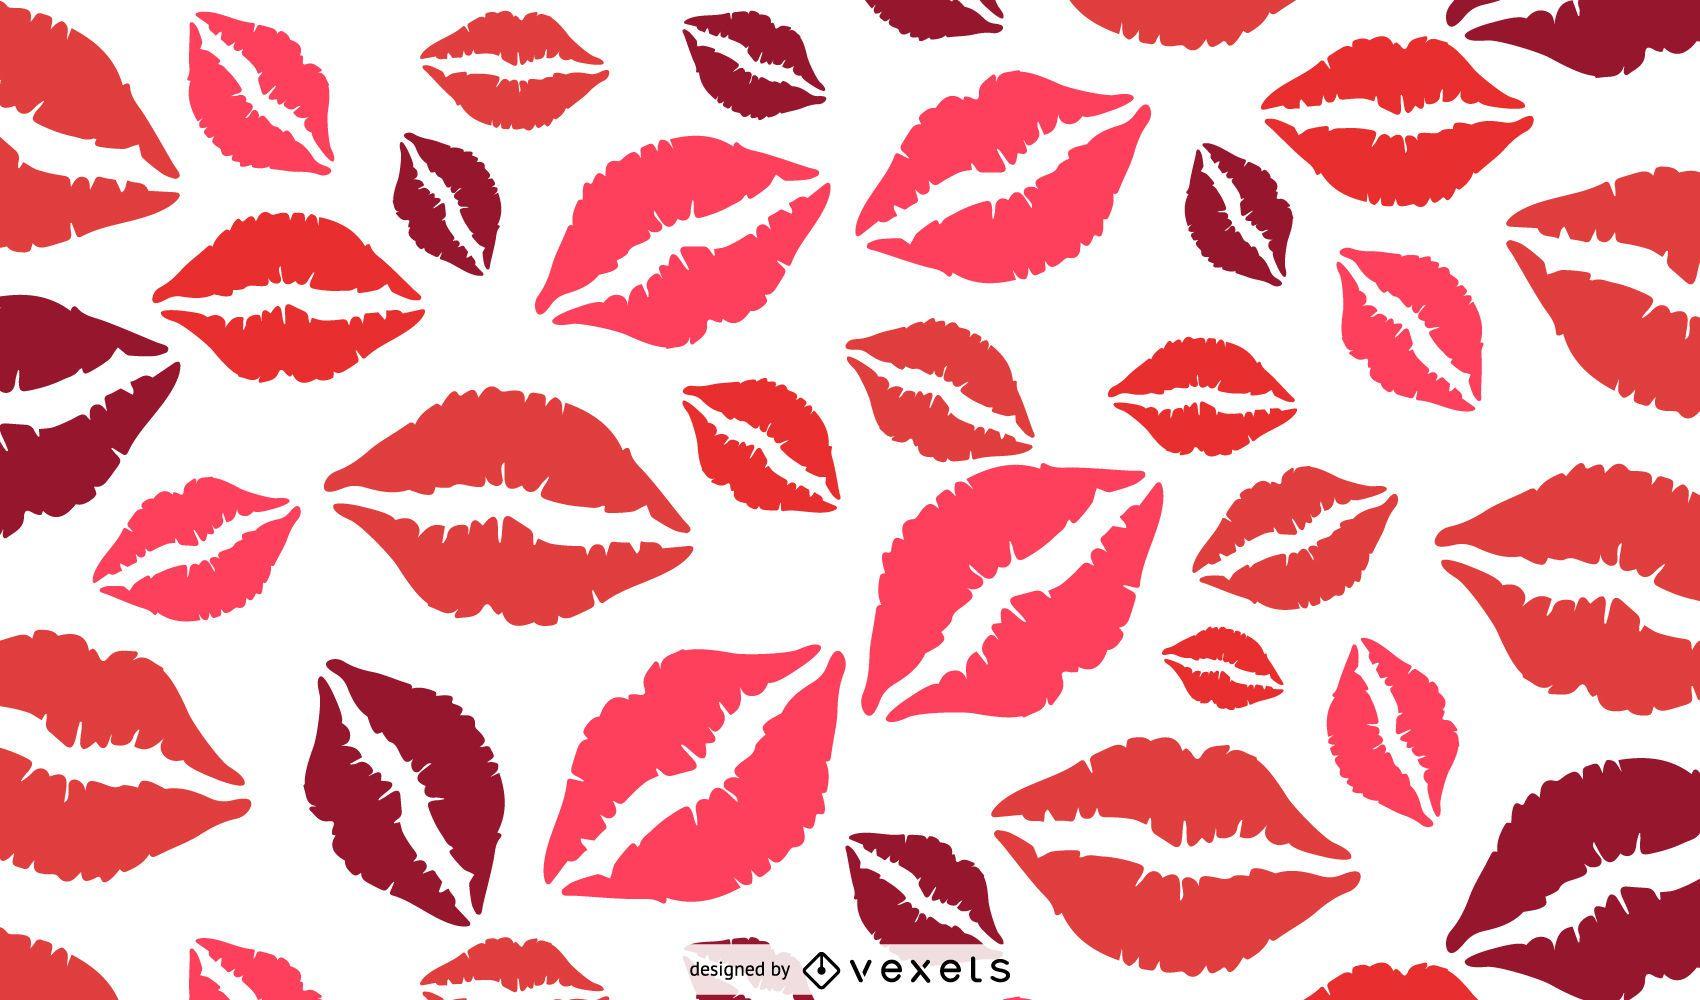 Red lips pattern design